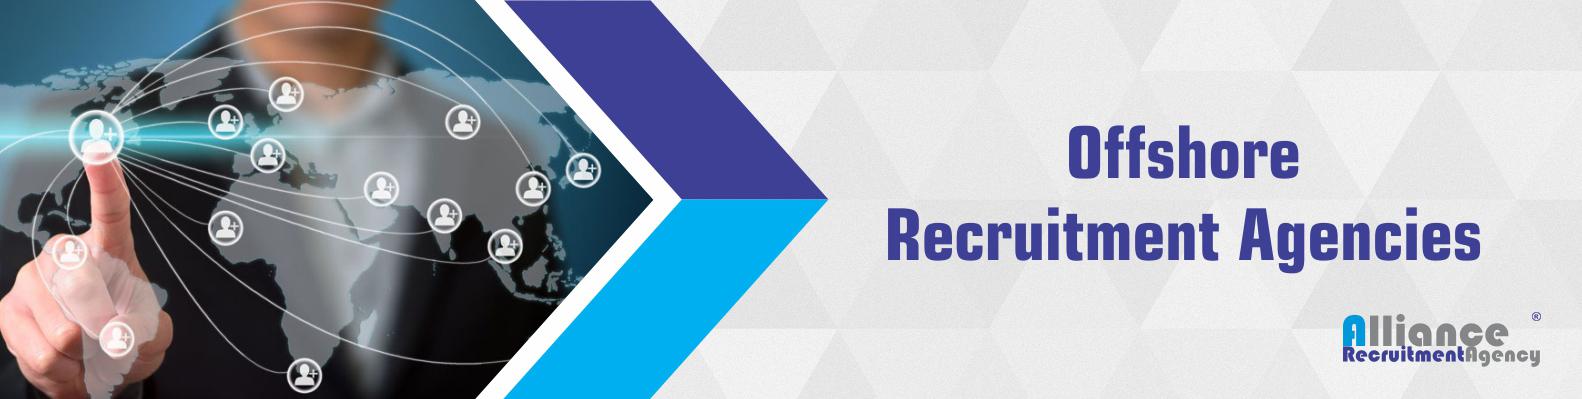 Best Recruitment Agencies - offshore recruitment agencies